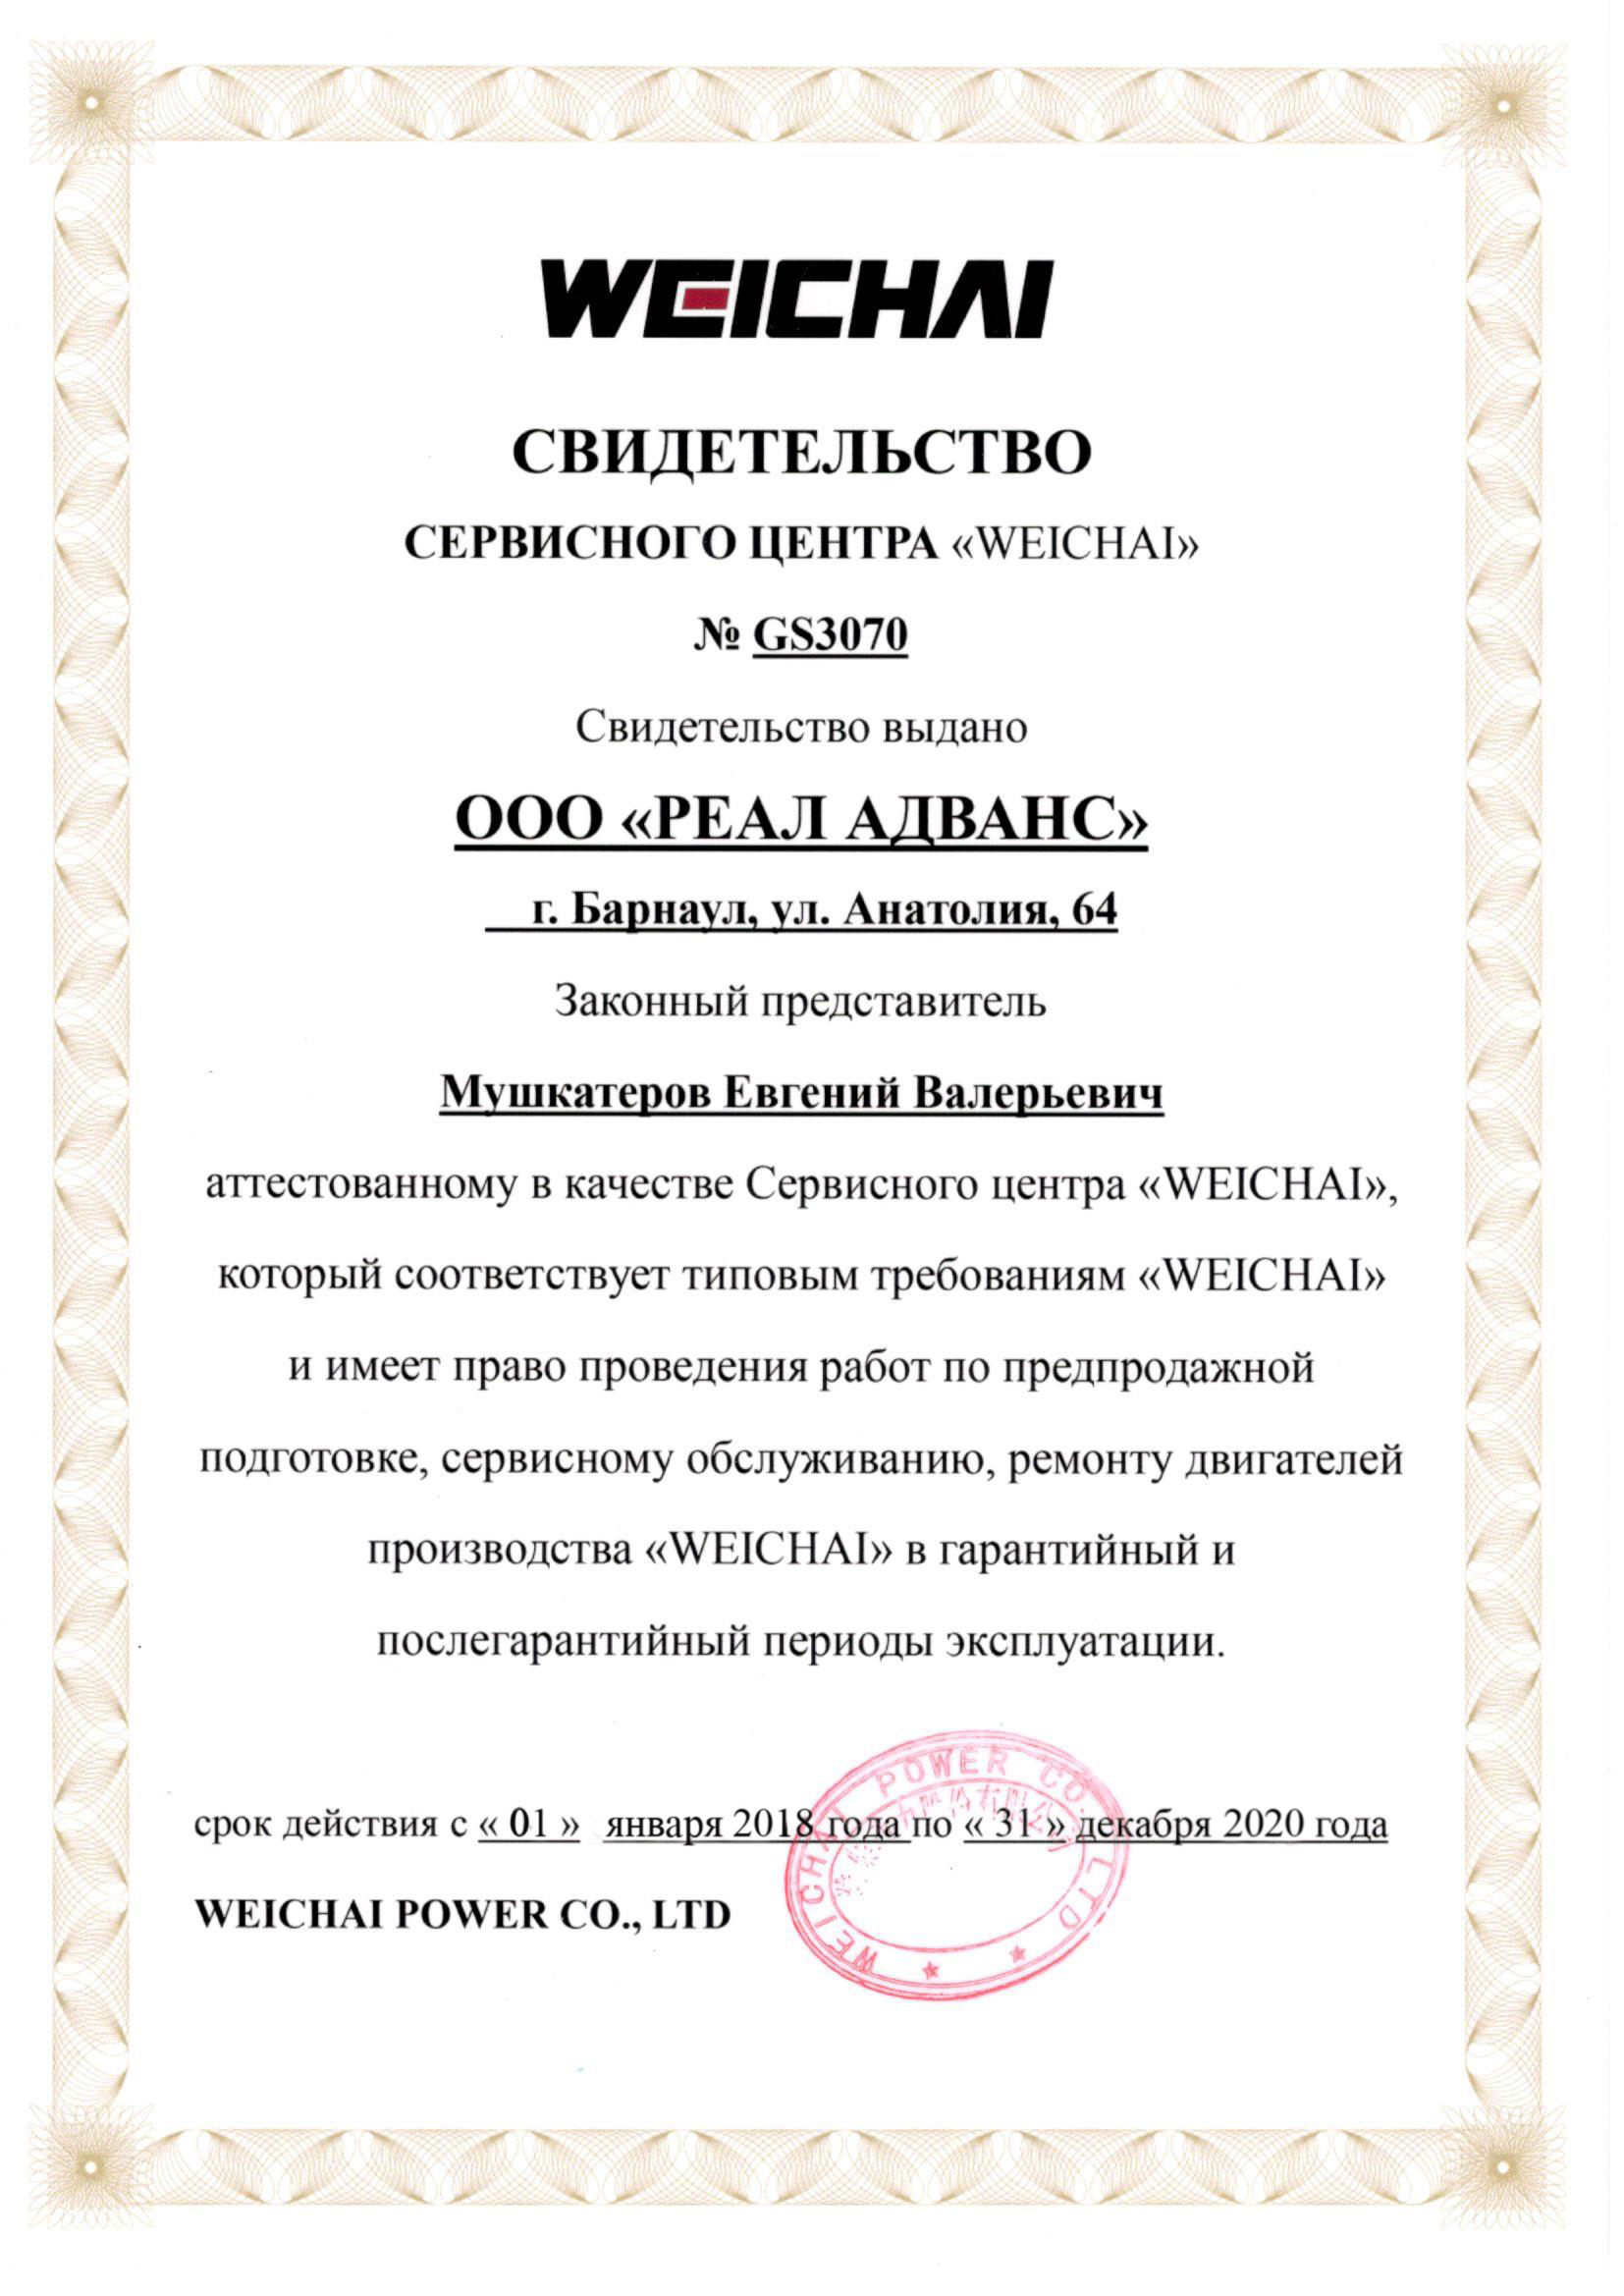 Сертификат сервисного центра Weichai Power